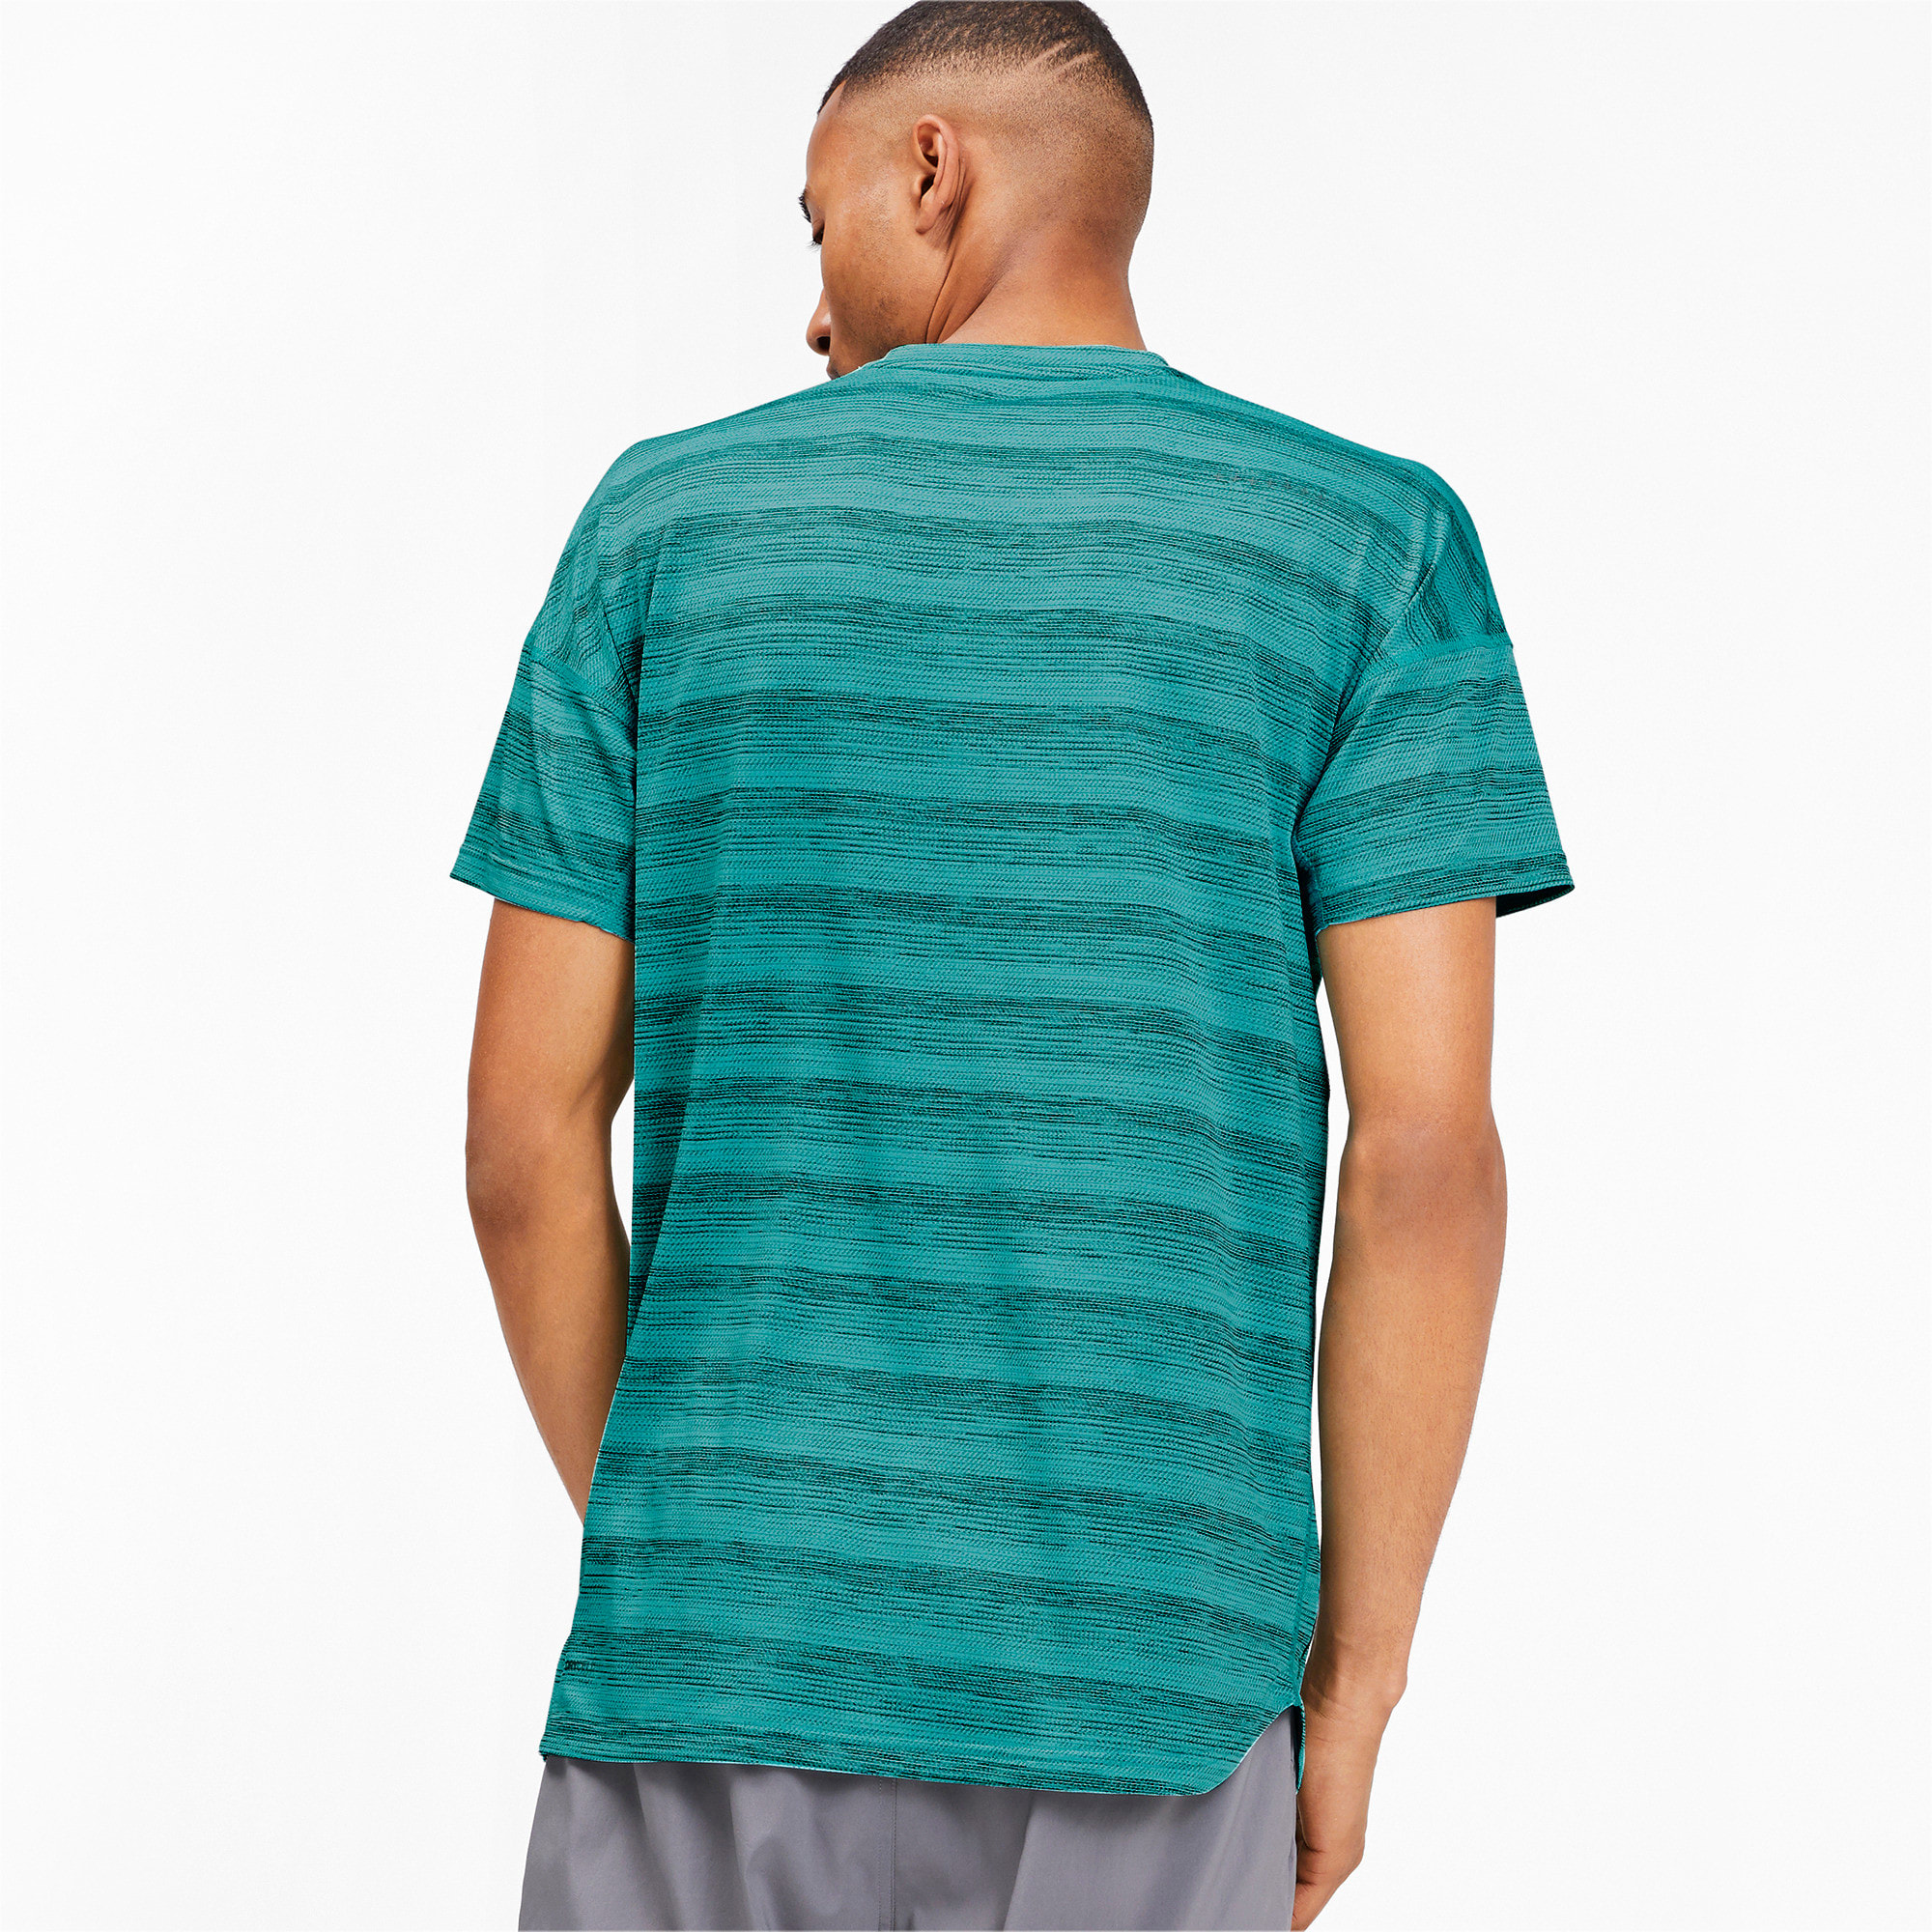 Thumbnail 2 of LAST LAP ヘザー SS ランニング Tシャツ 半袖, Blue Turquoise Heather, medium-JPN